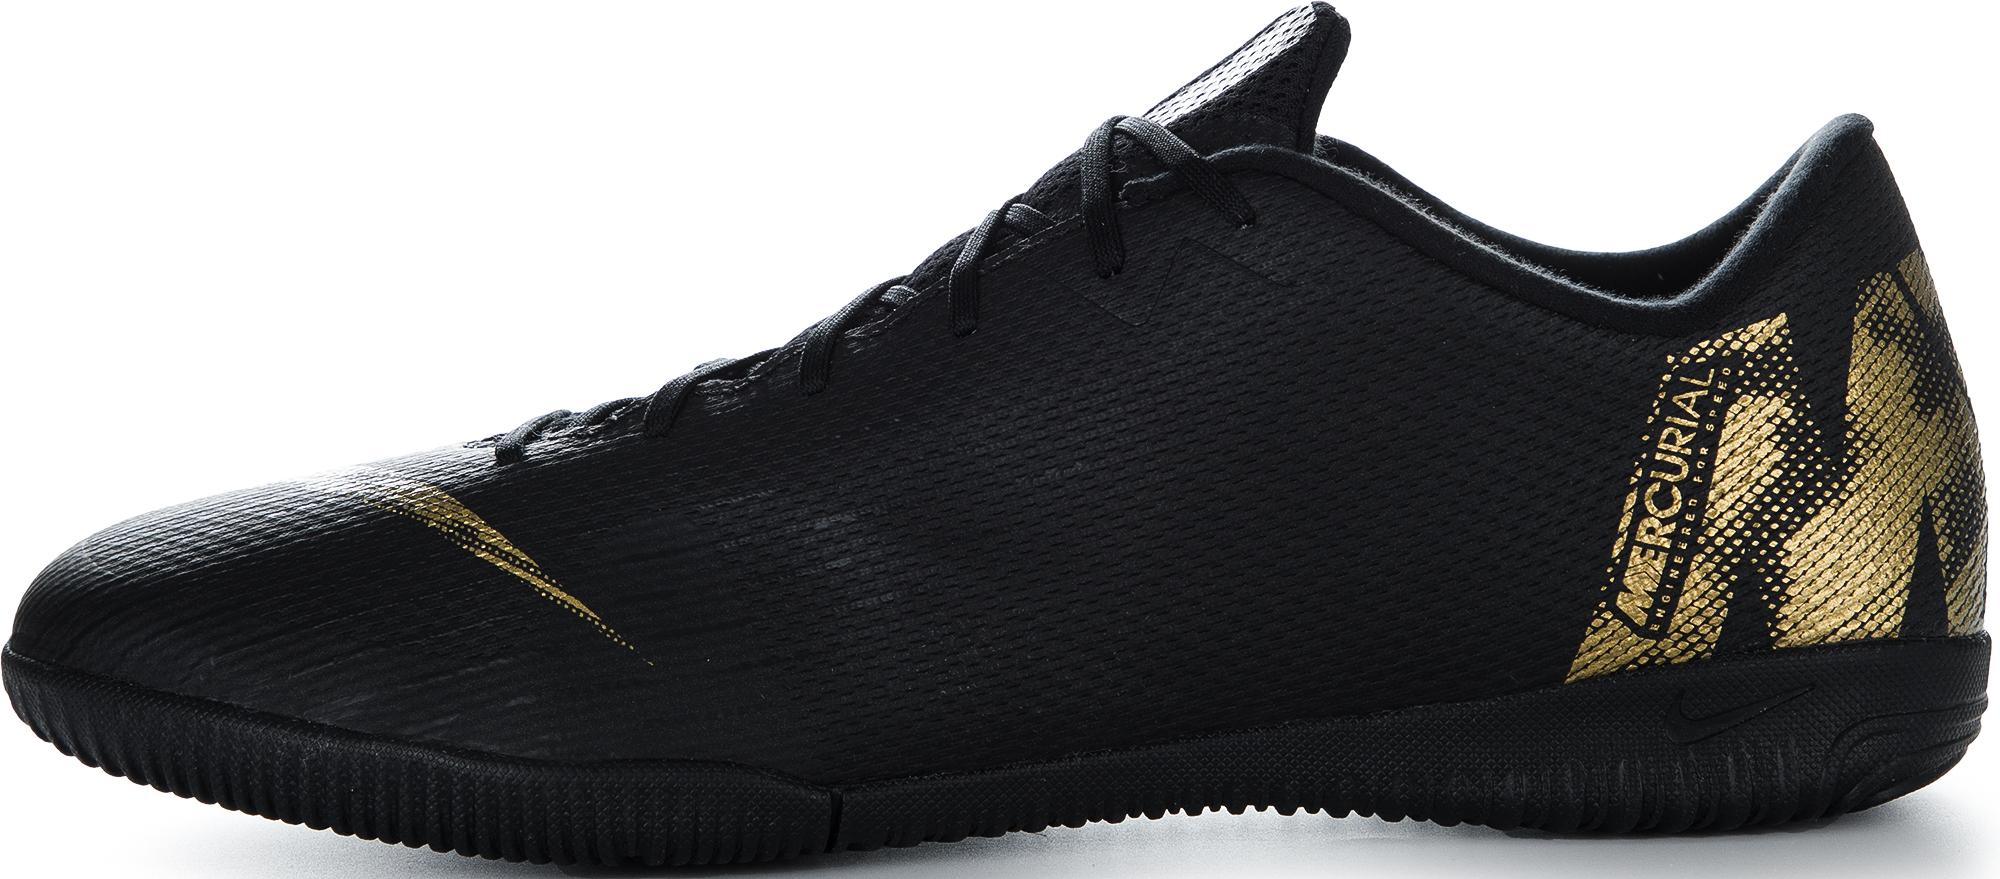 Nike Бутсы мужские Nike Mercurial Vapor 12 Academy IC, размер 45 цена